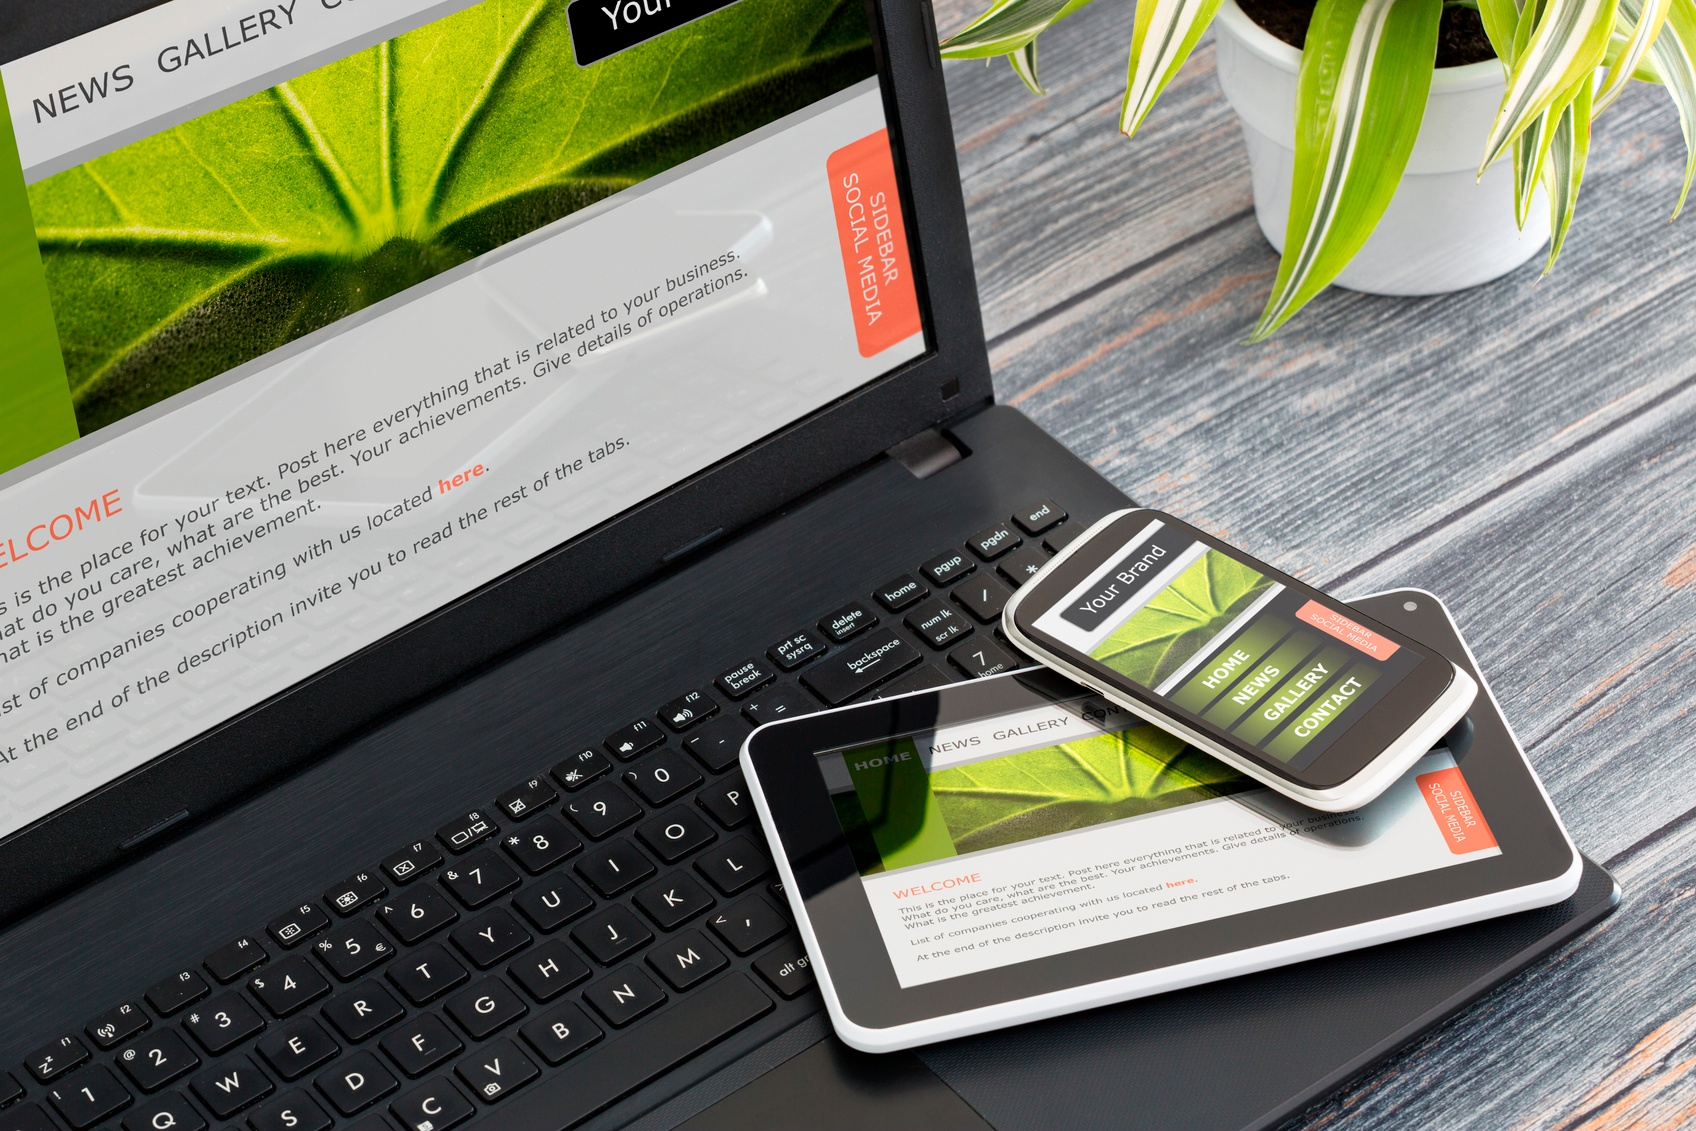 Responsive-web-design-000067717361_Medium.jpg